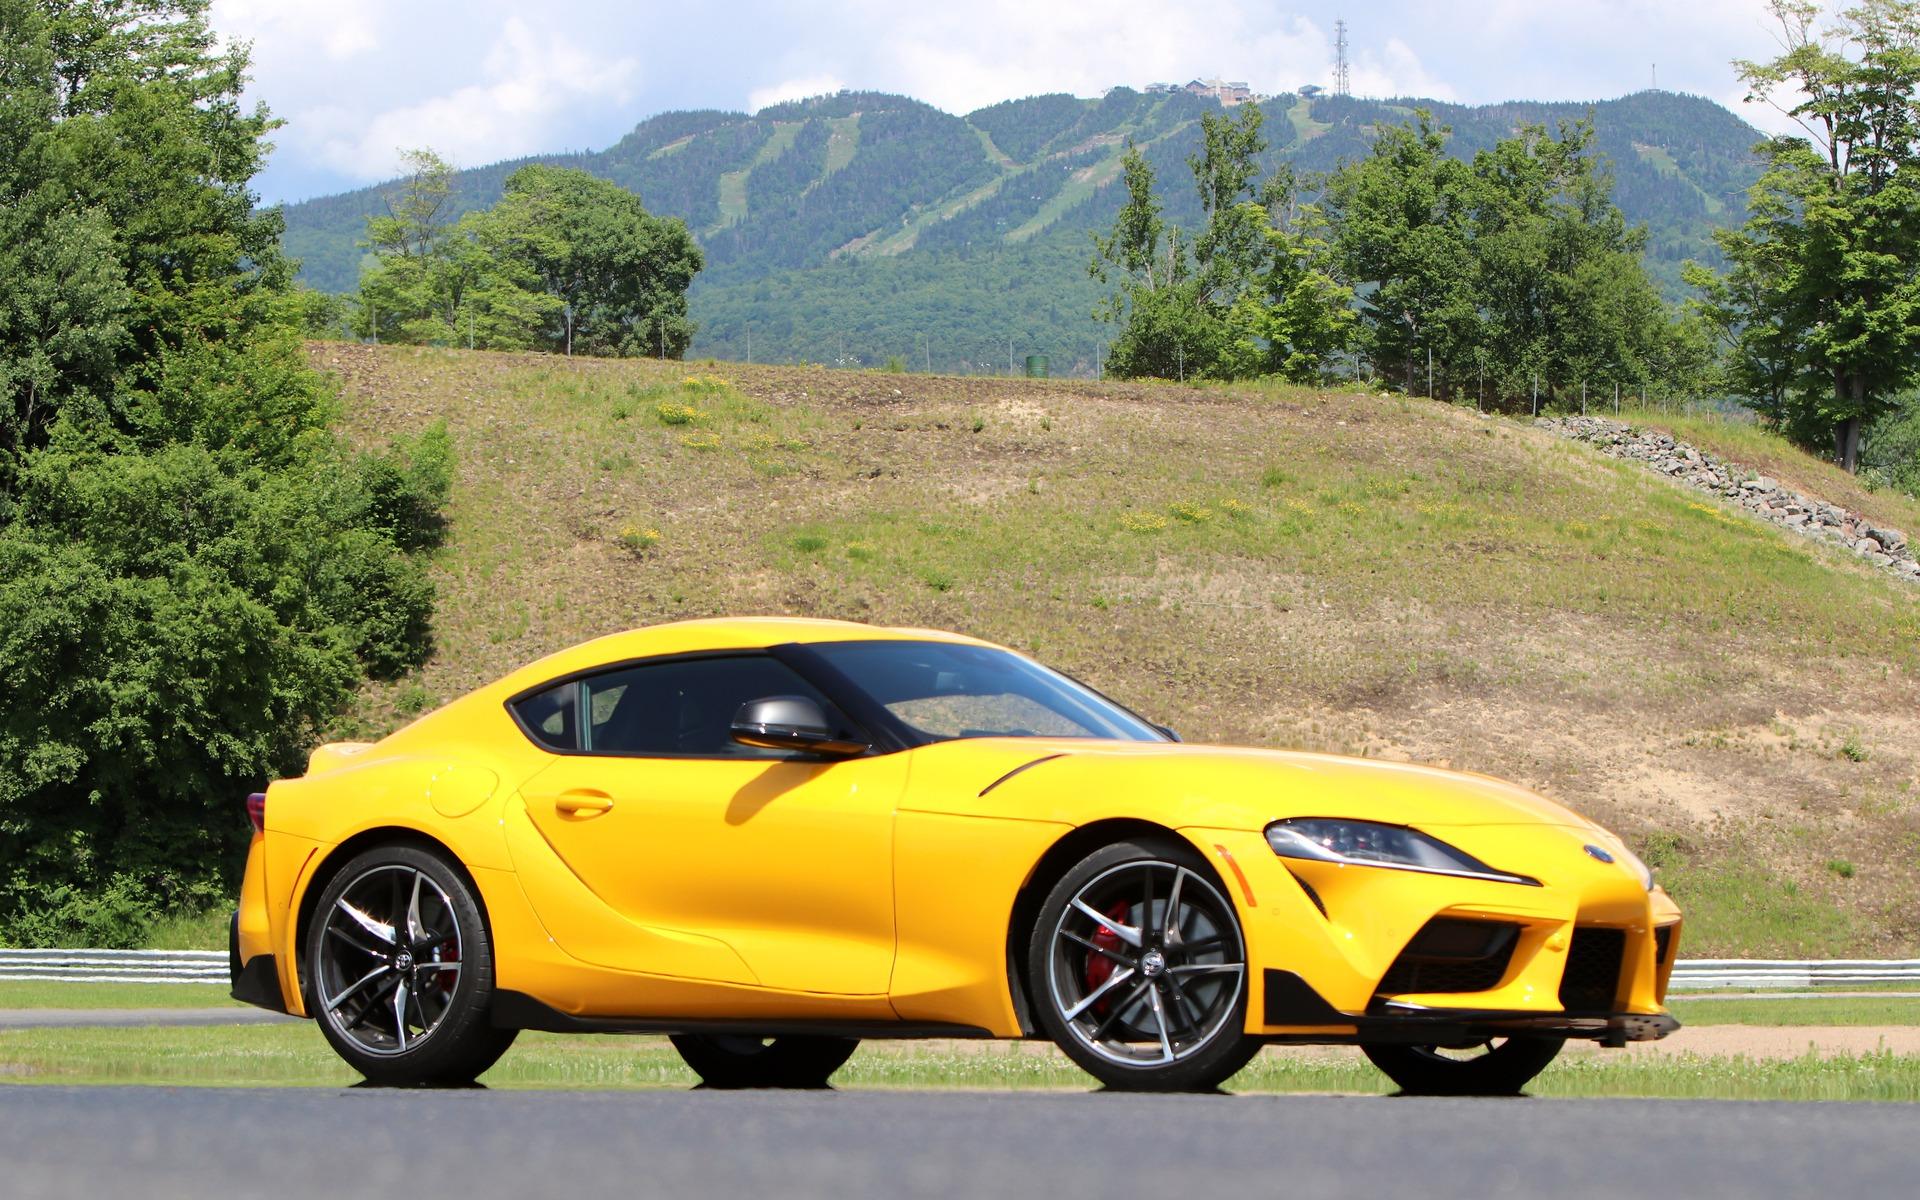 Yellow Toyota GR Supra